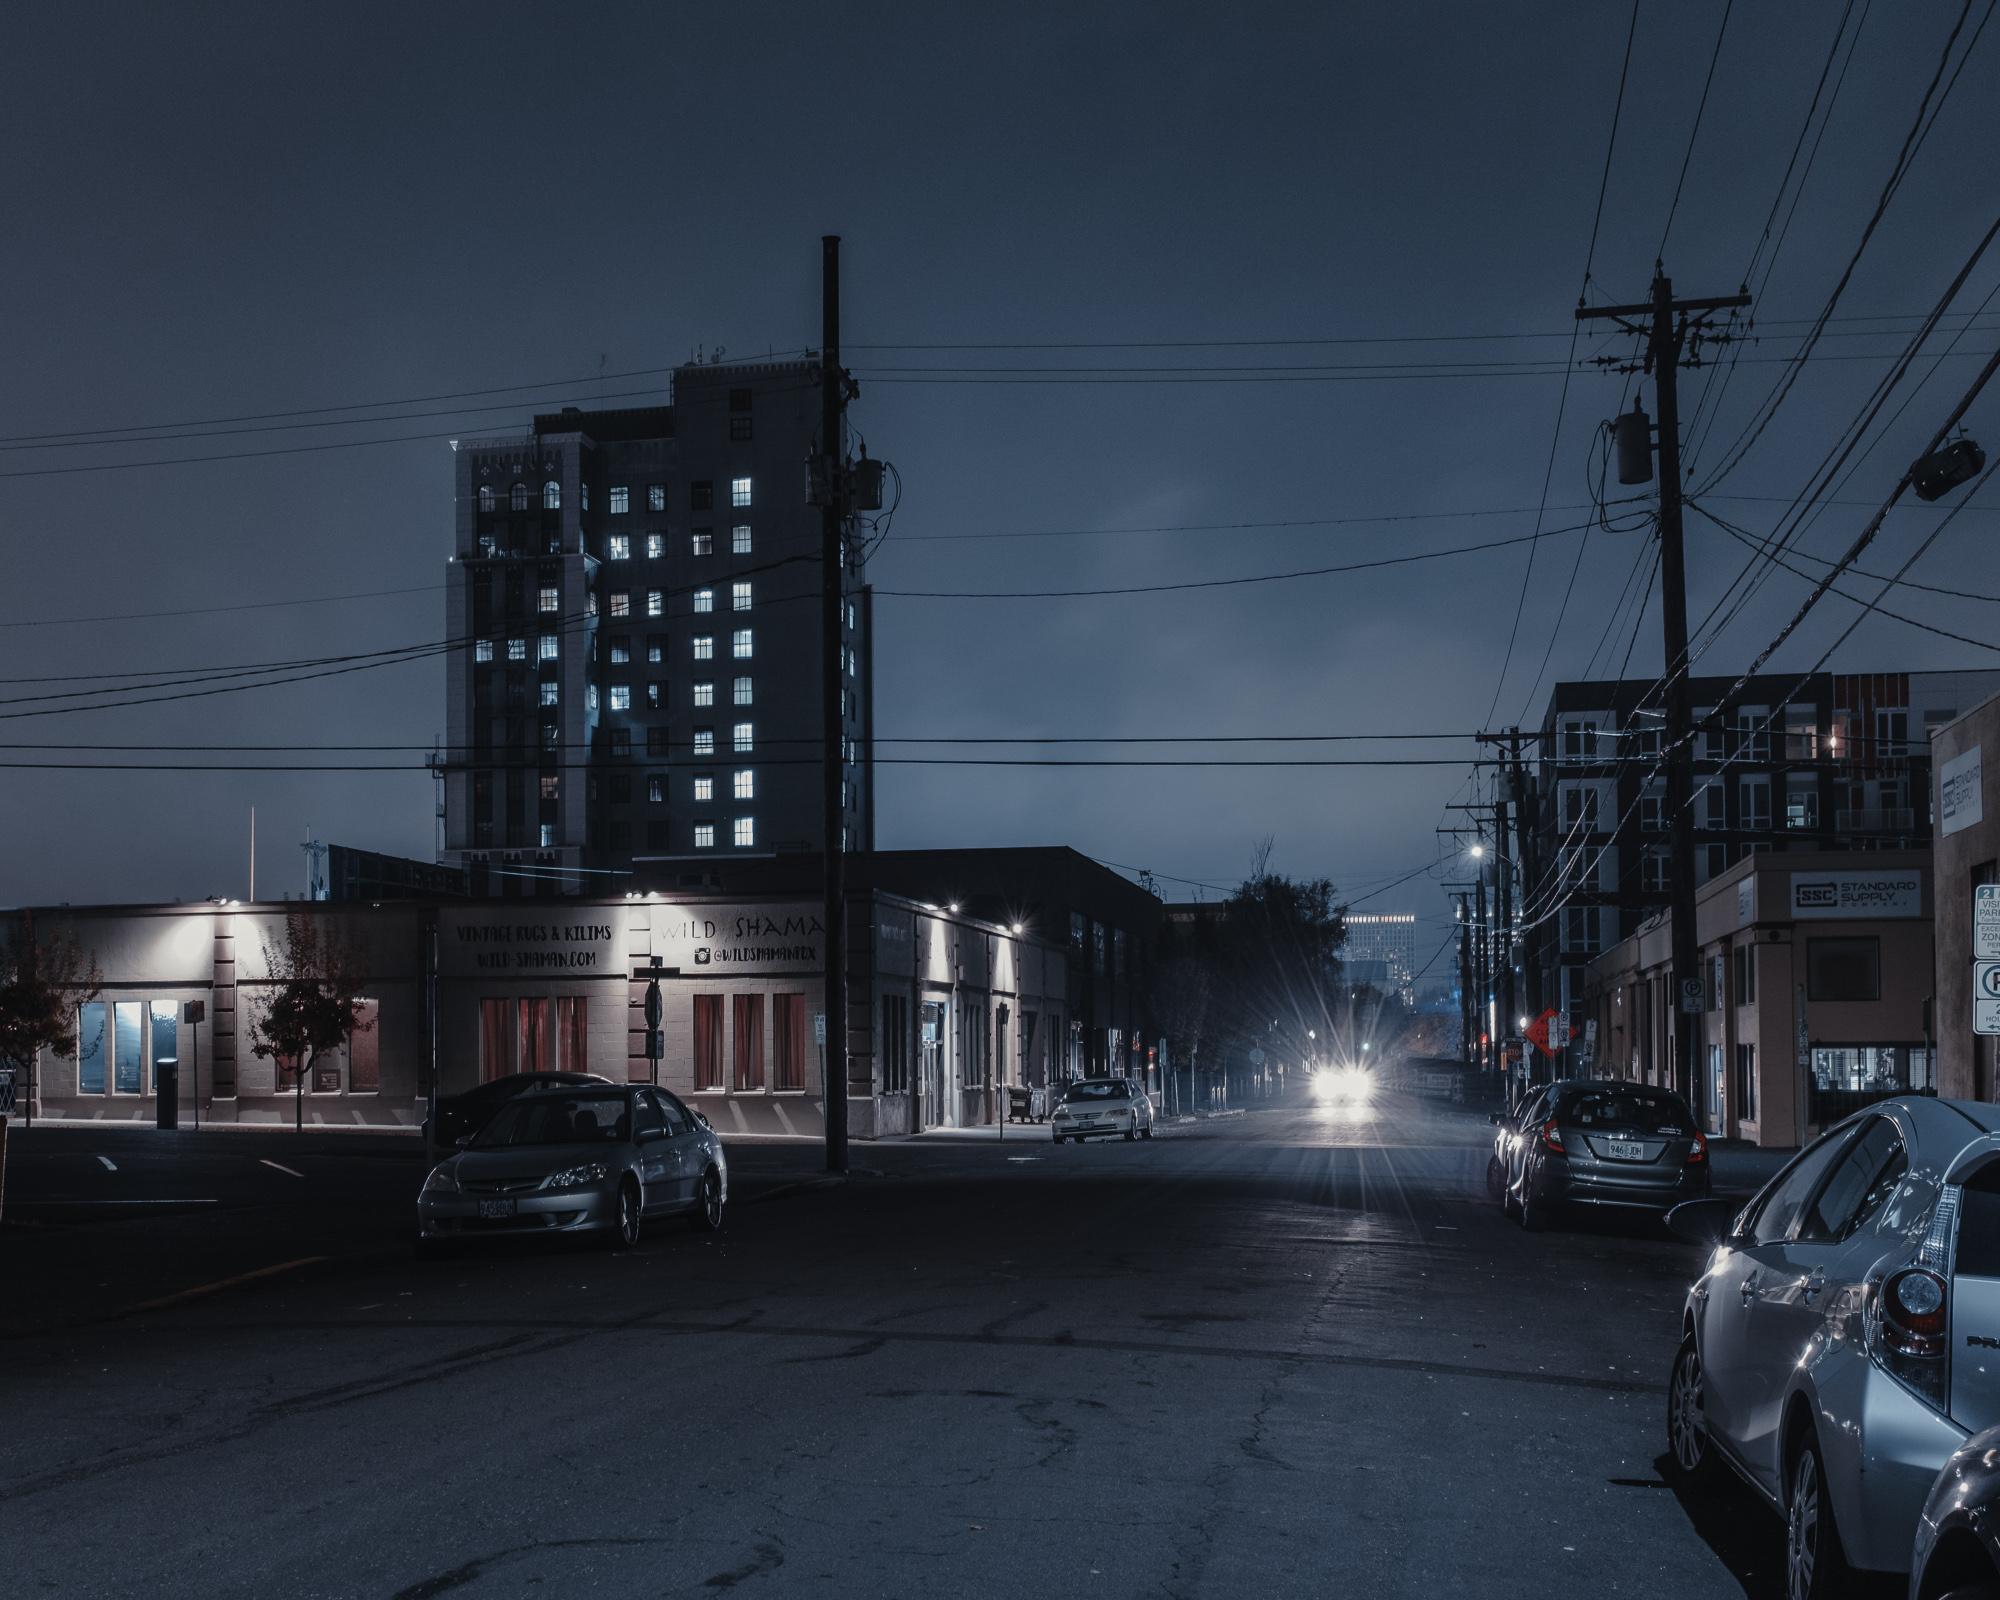 Nights-49.jpg